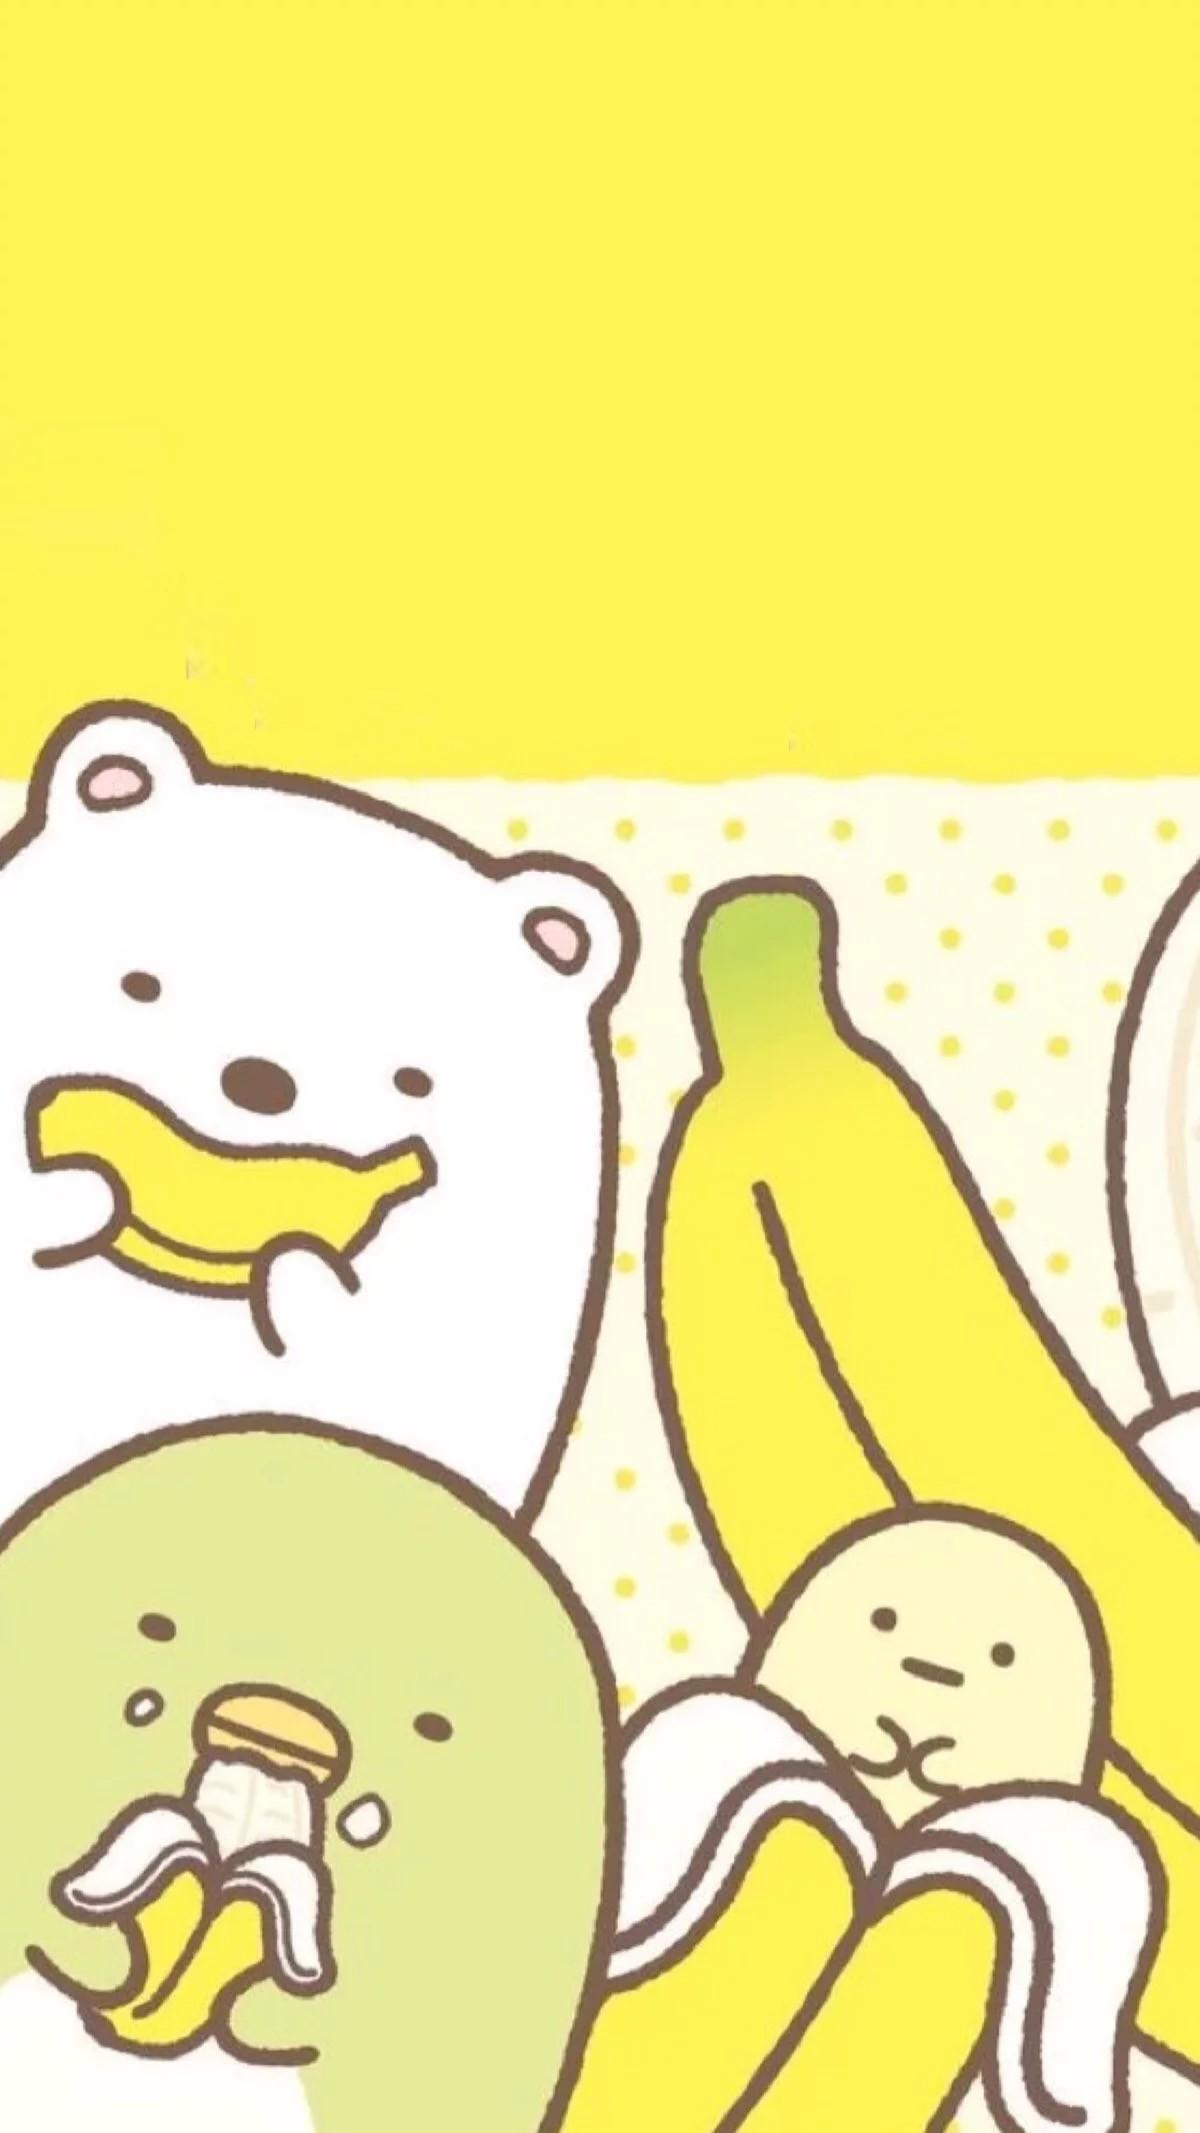 Kawaii Stuff, Sanrio, Iphone Wallpaper, Doodles, Cartoons, Ipad